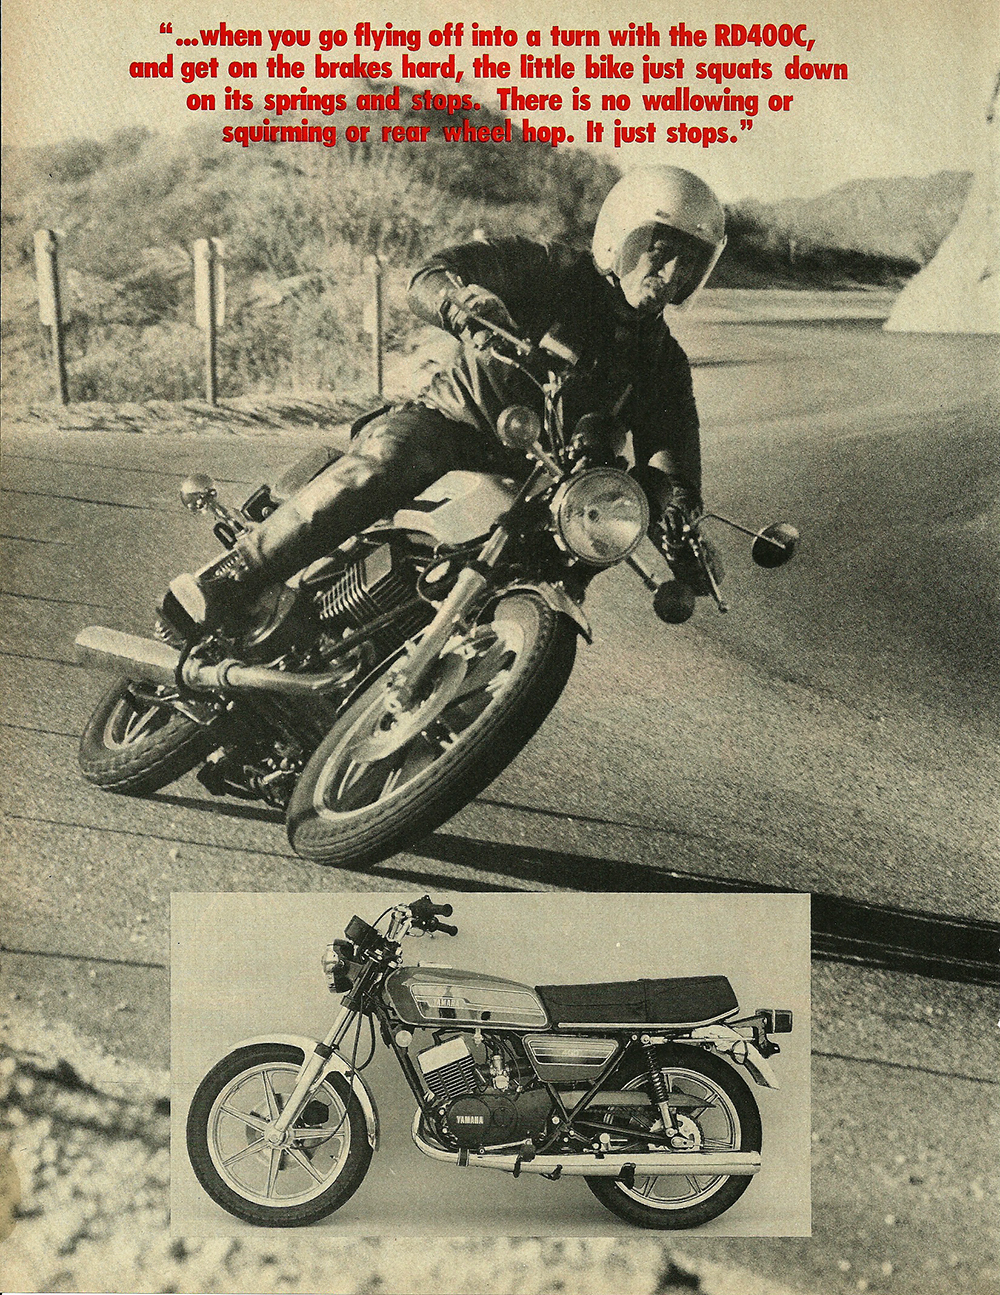 1976 Yamaha RD400C road test 3.jpg